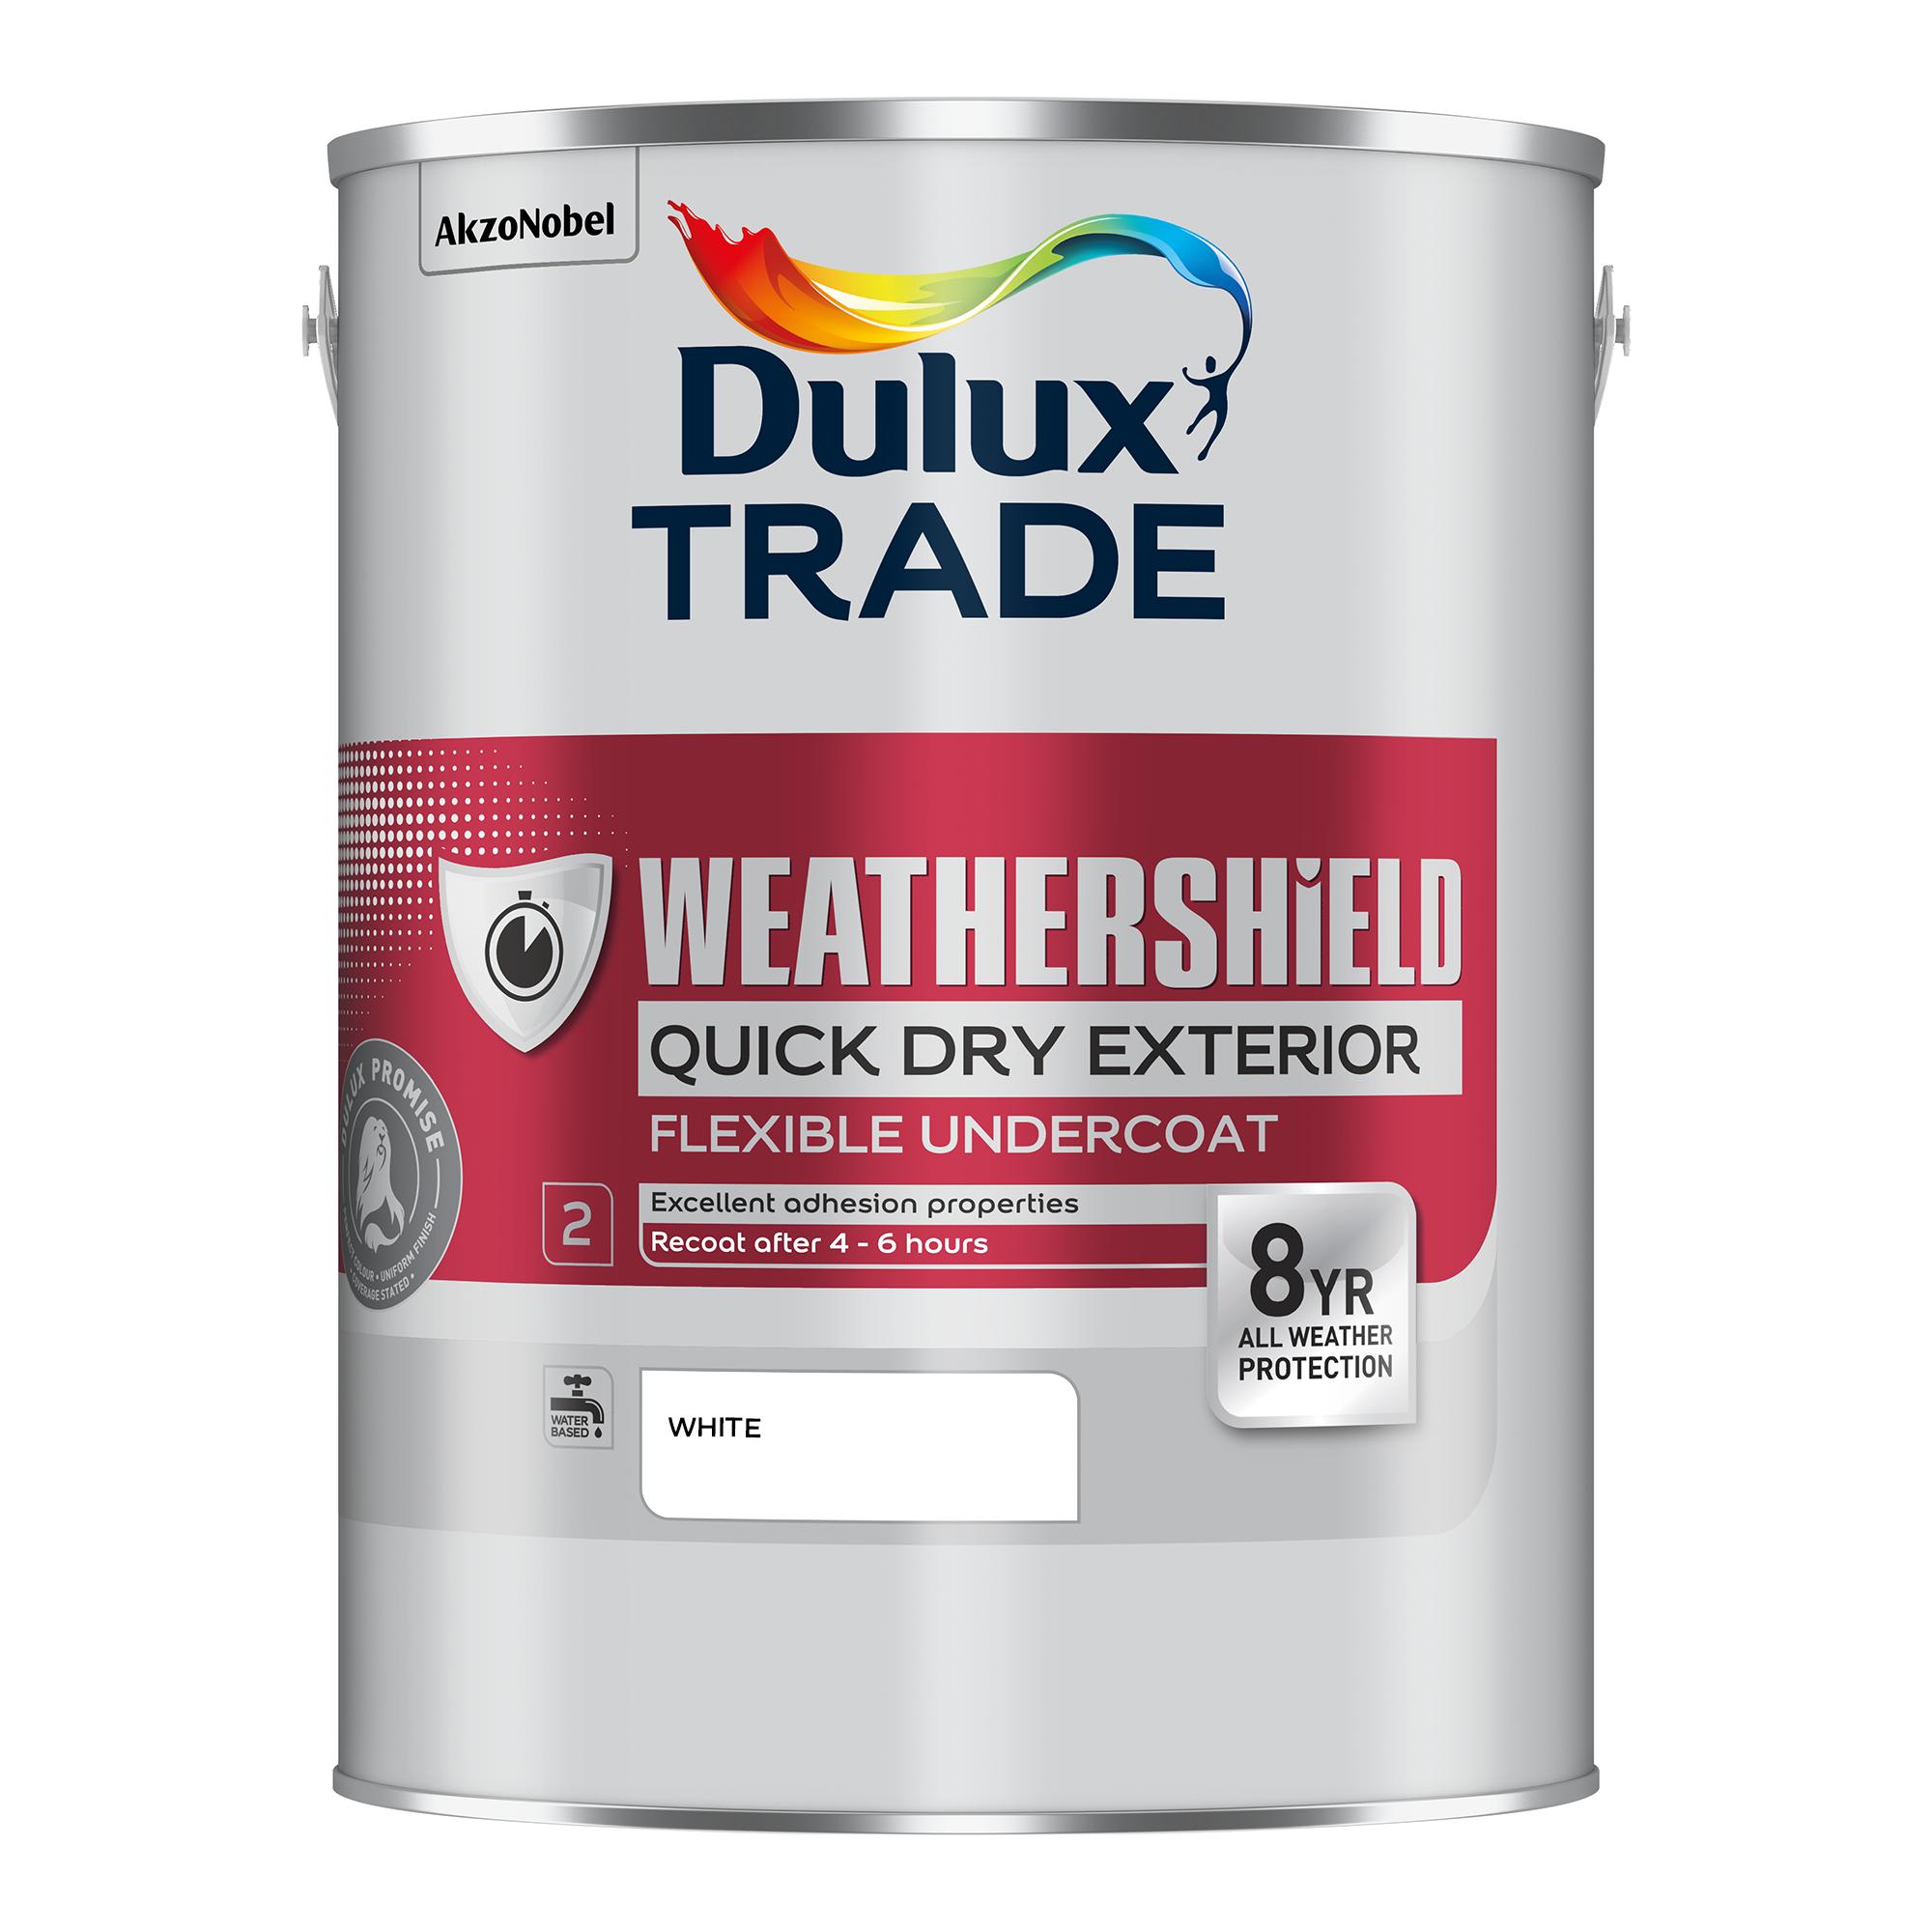 Dulux Trade Weathershield Quick Dry Exterior Undercoat